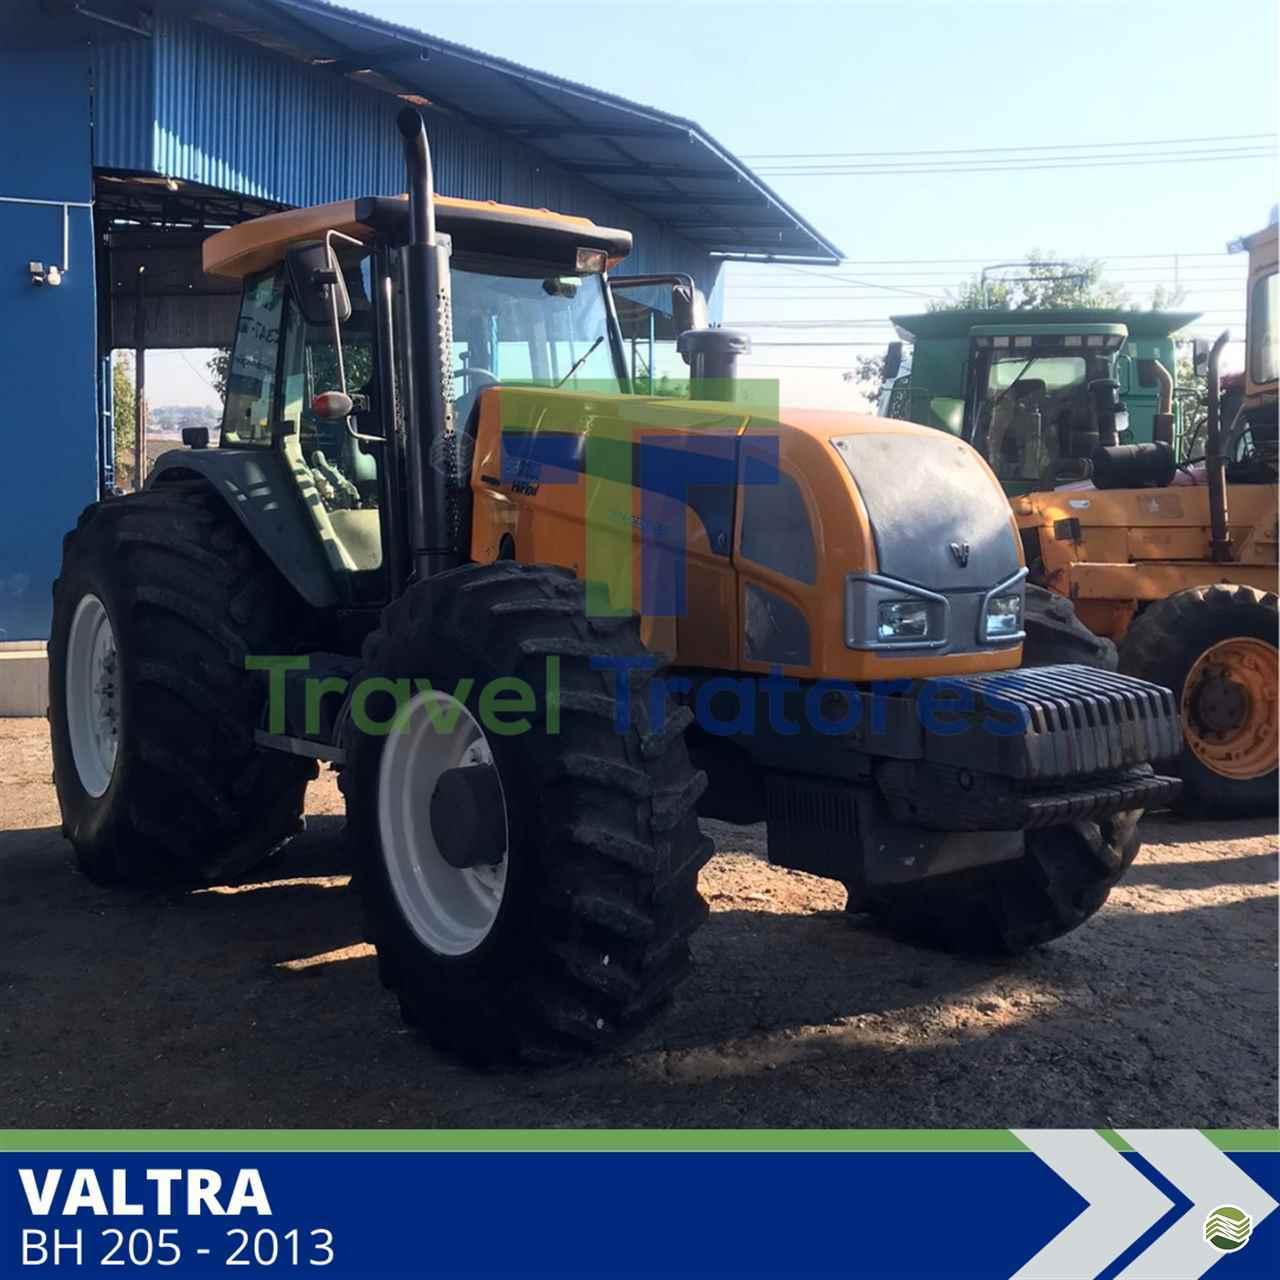 VALTRA BH 205 de Travel Máquinas Agrícolas - LONDRINA/PR